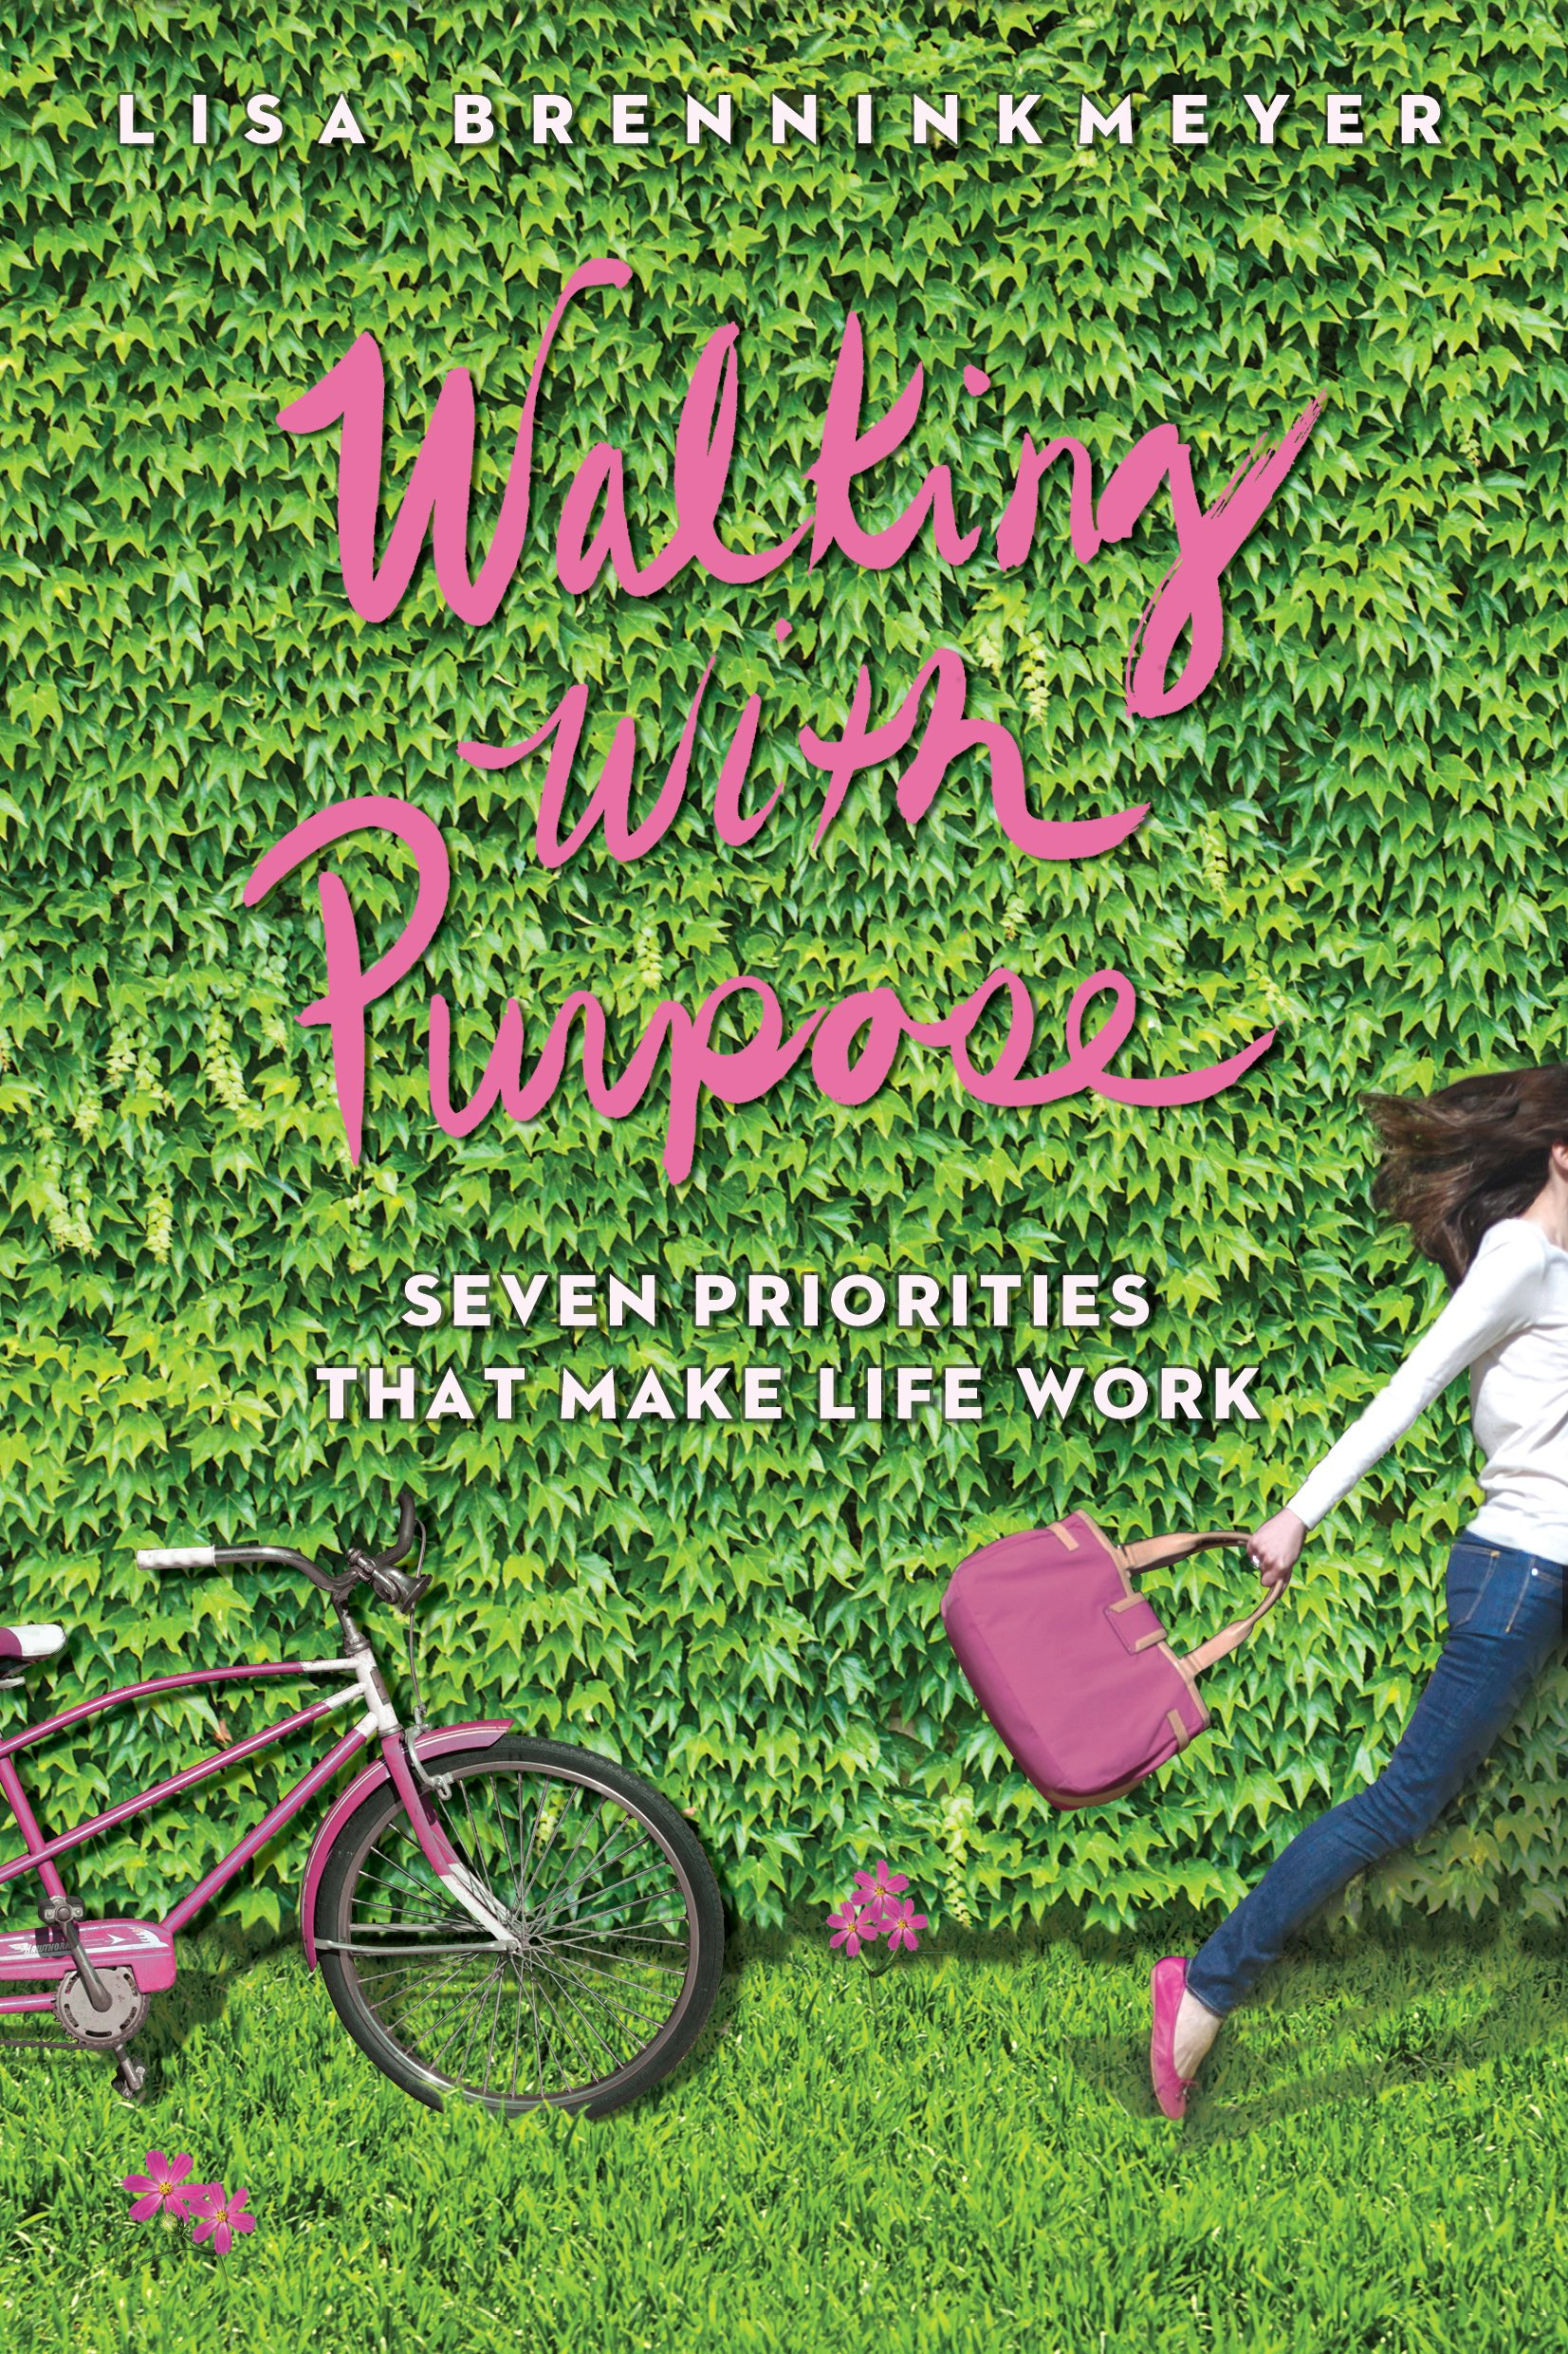 Walking with Purpose: Seven Priorities That Make Life Work